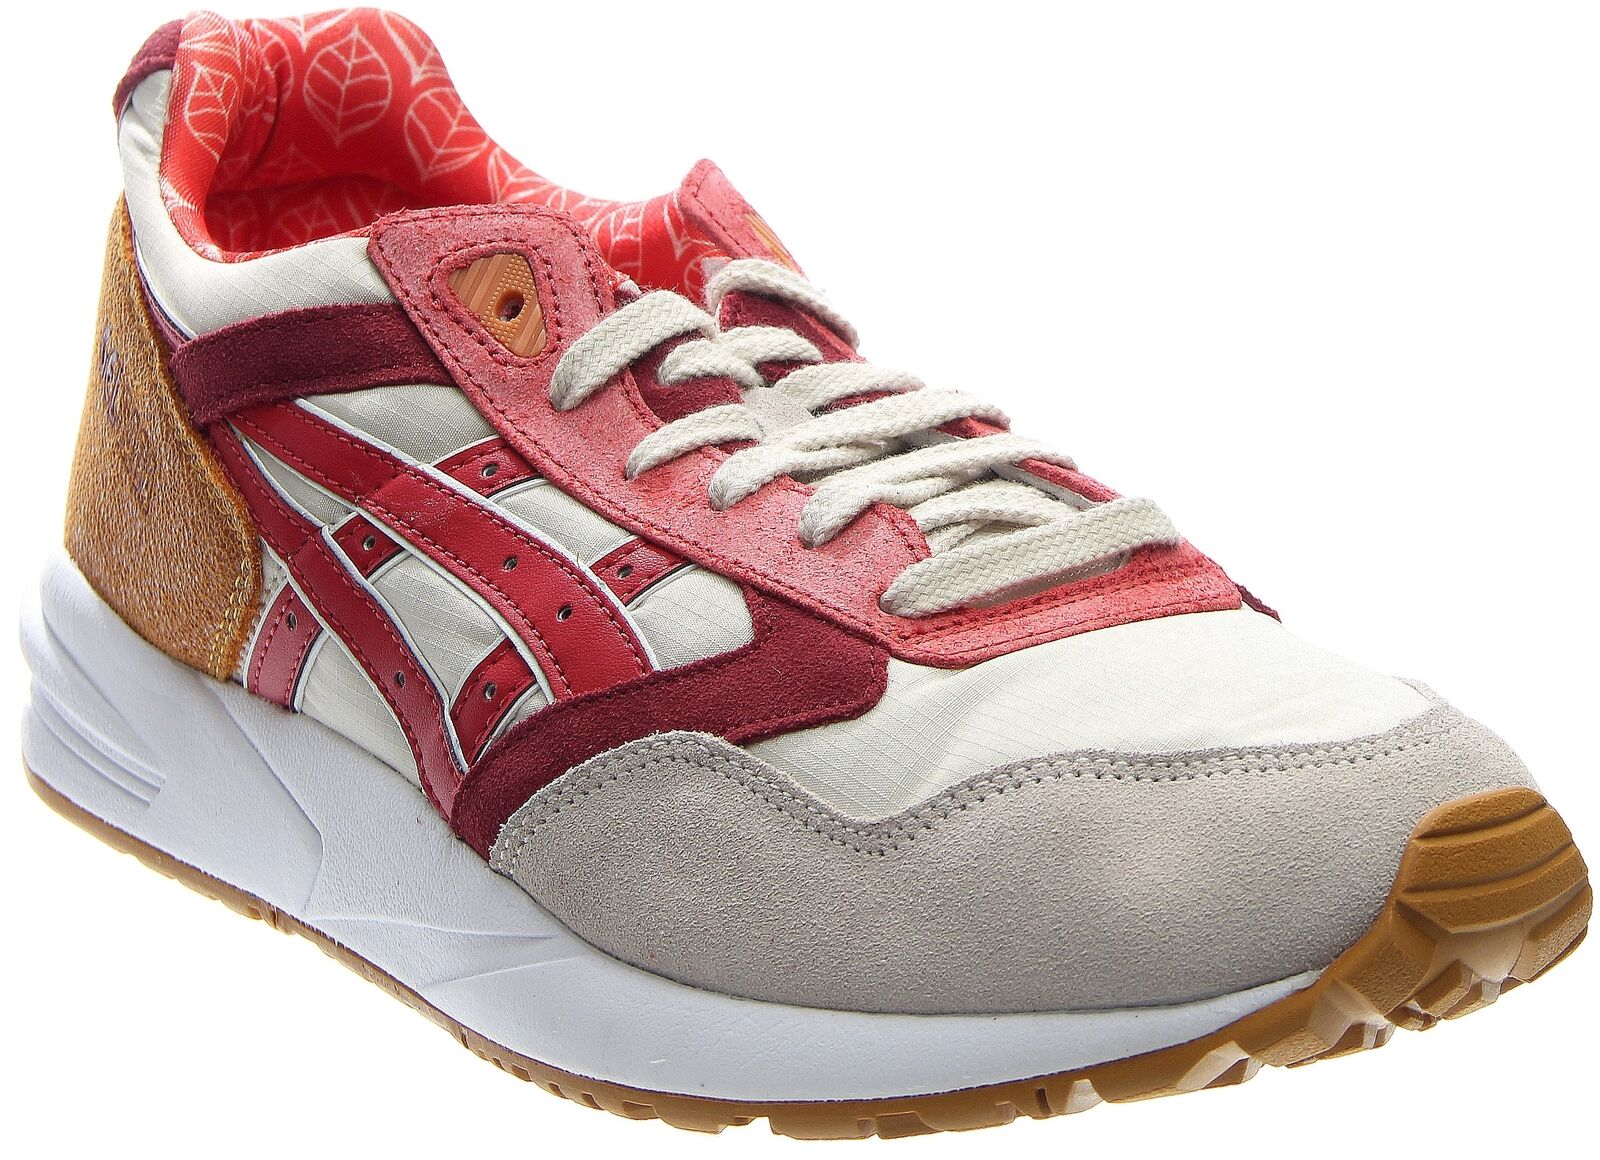 ASICS GEL-Saga  Athletic Running Trail shoes - Bone - Mens